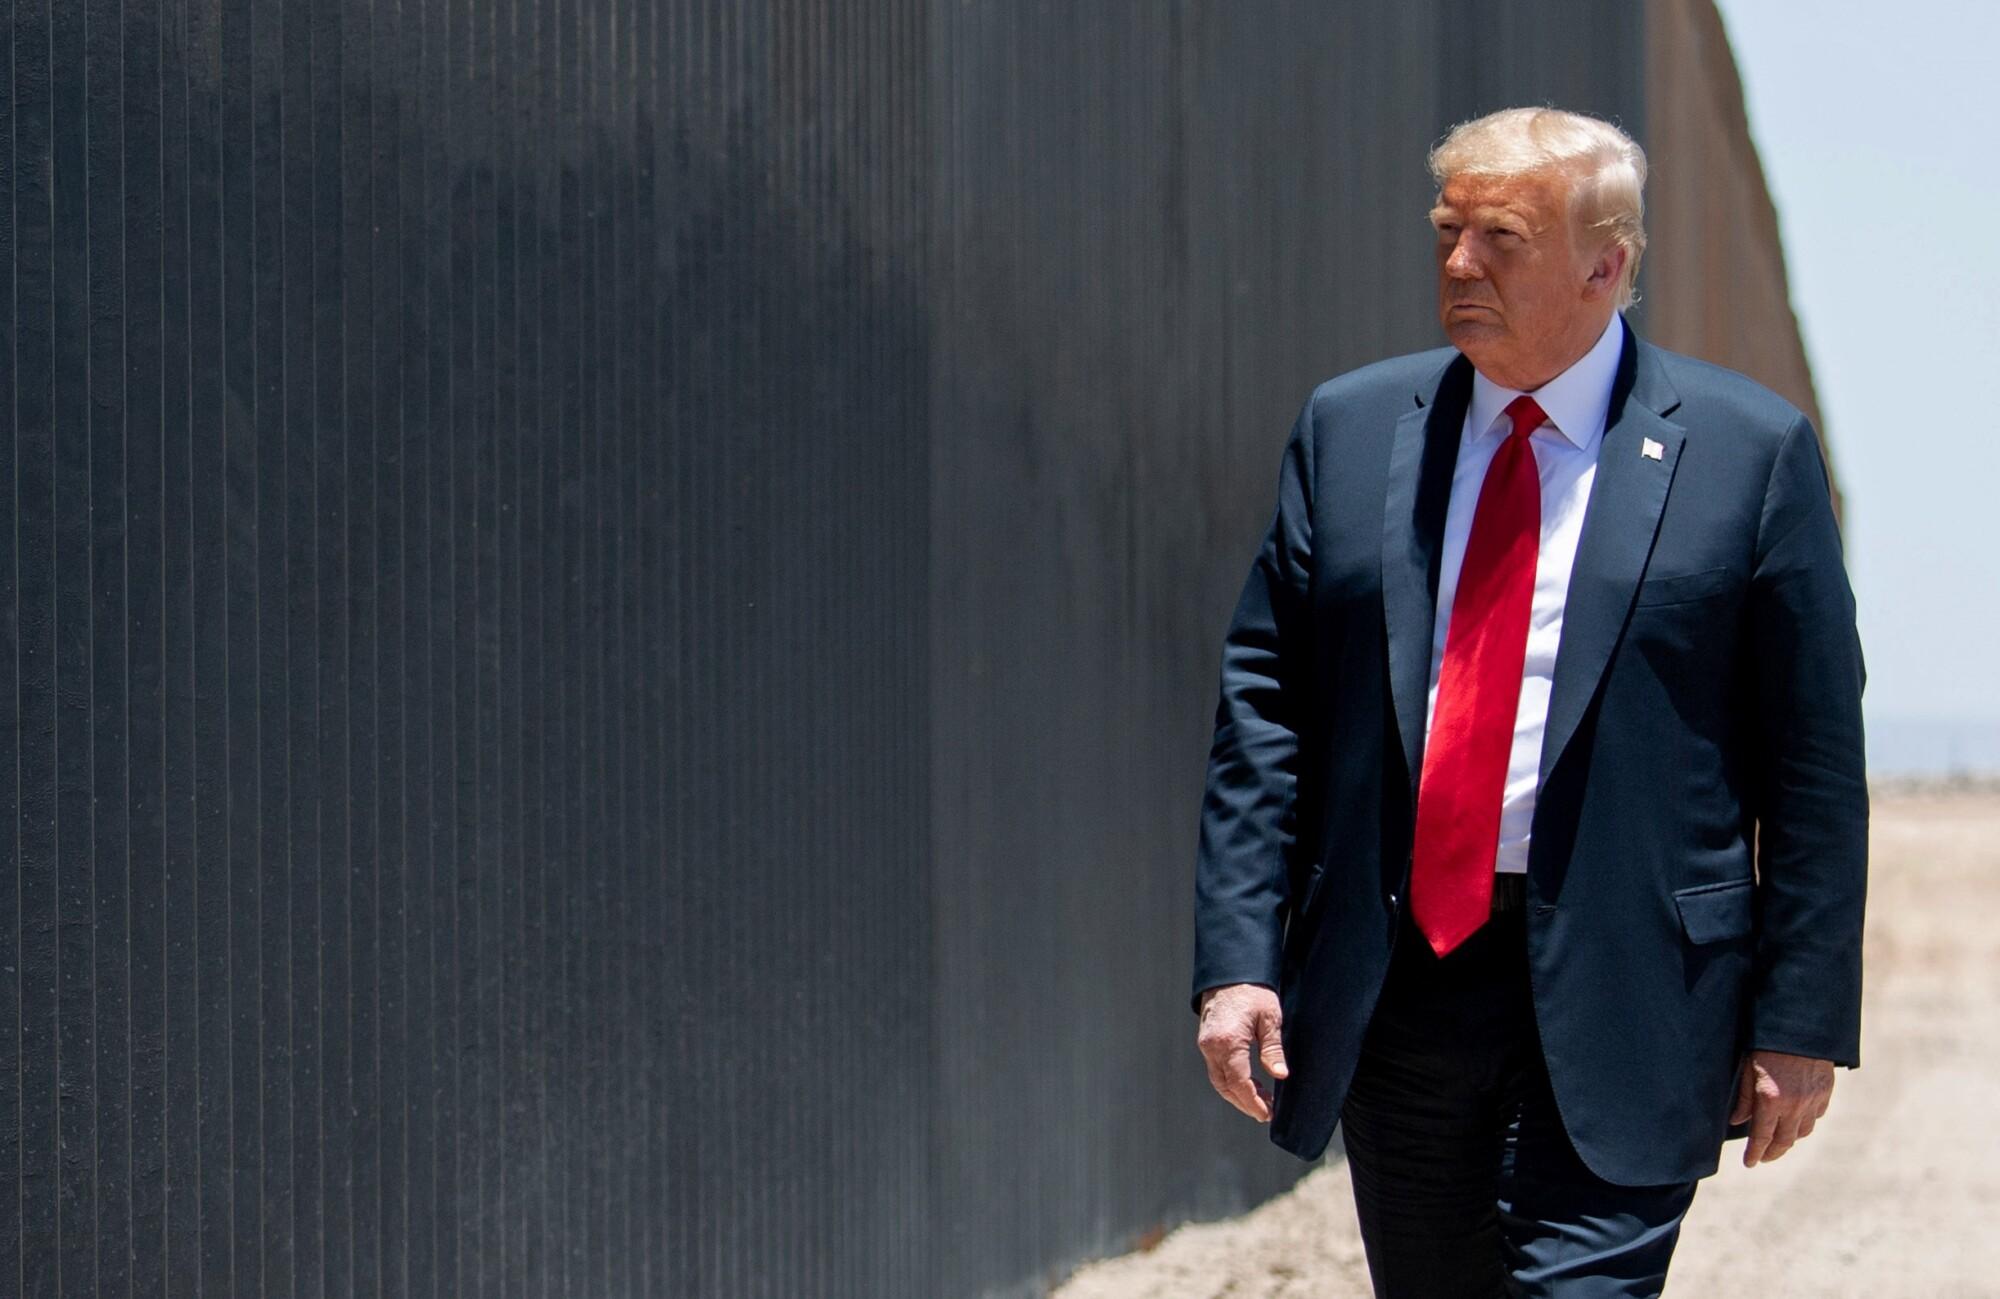 Trump Extends Border Emergency Until February 2022